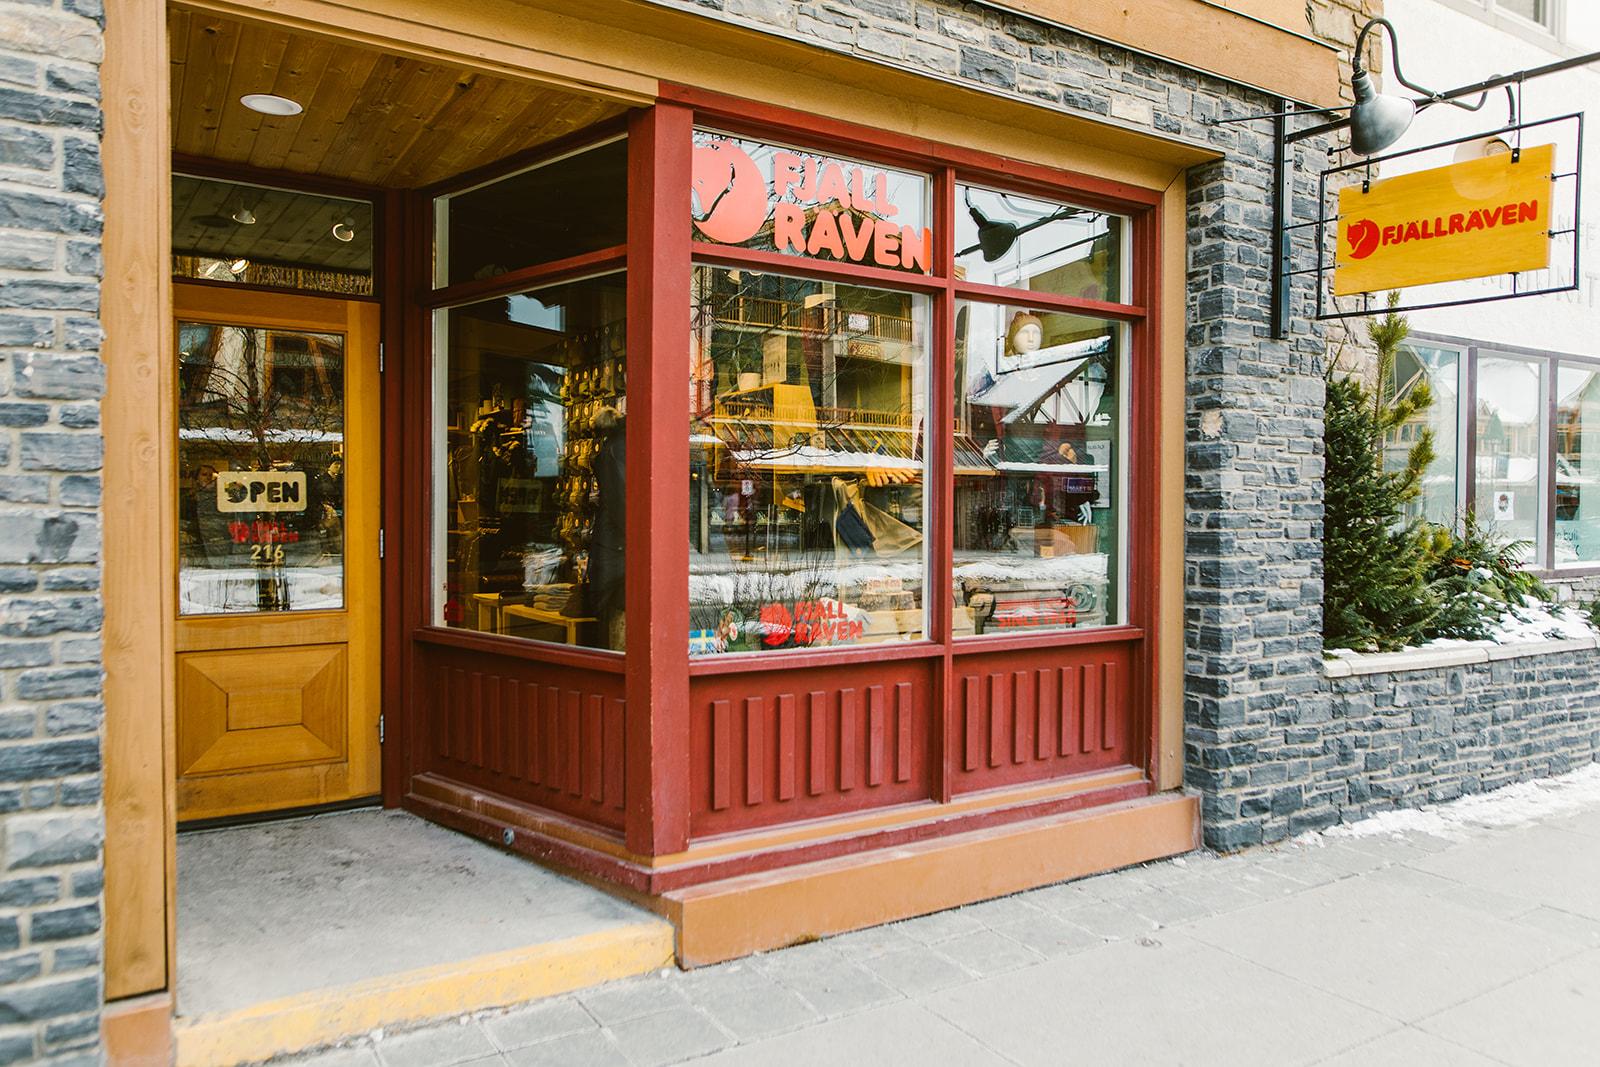 Fjallraven retailer in Banff, Alberta